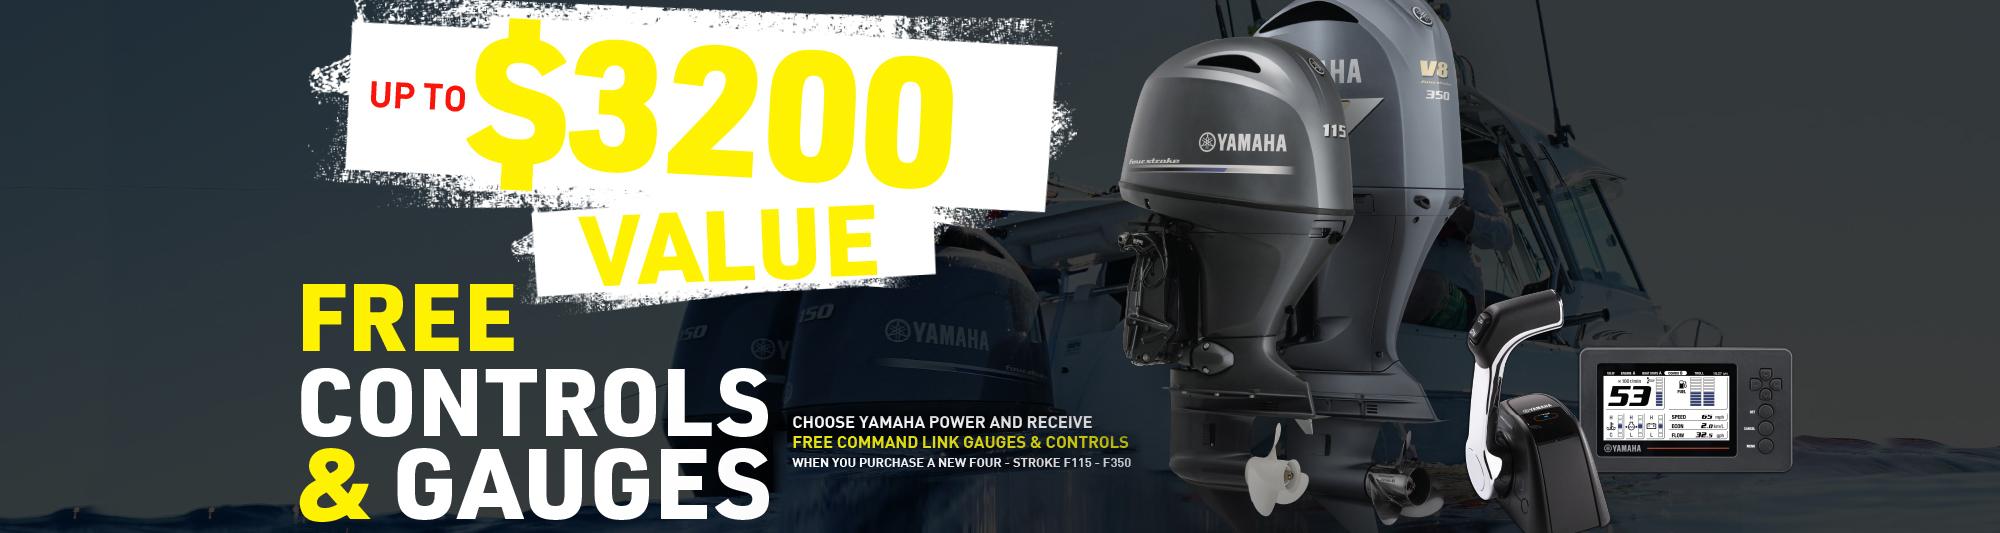 yamaha-free-rigging